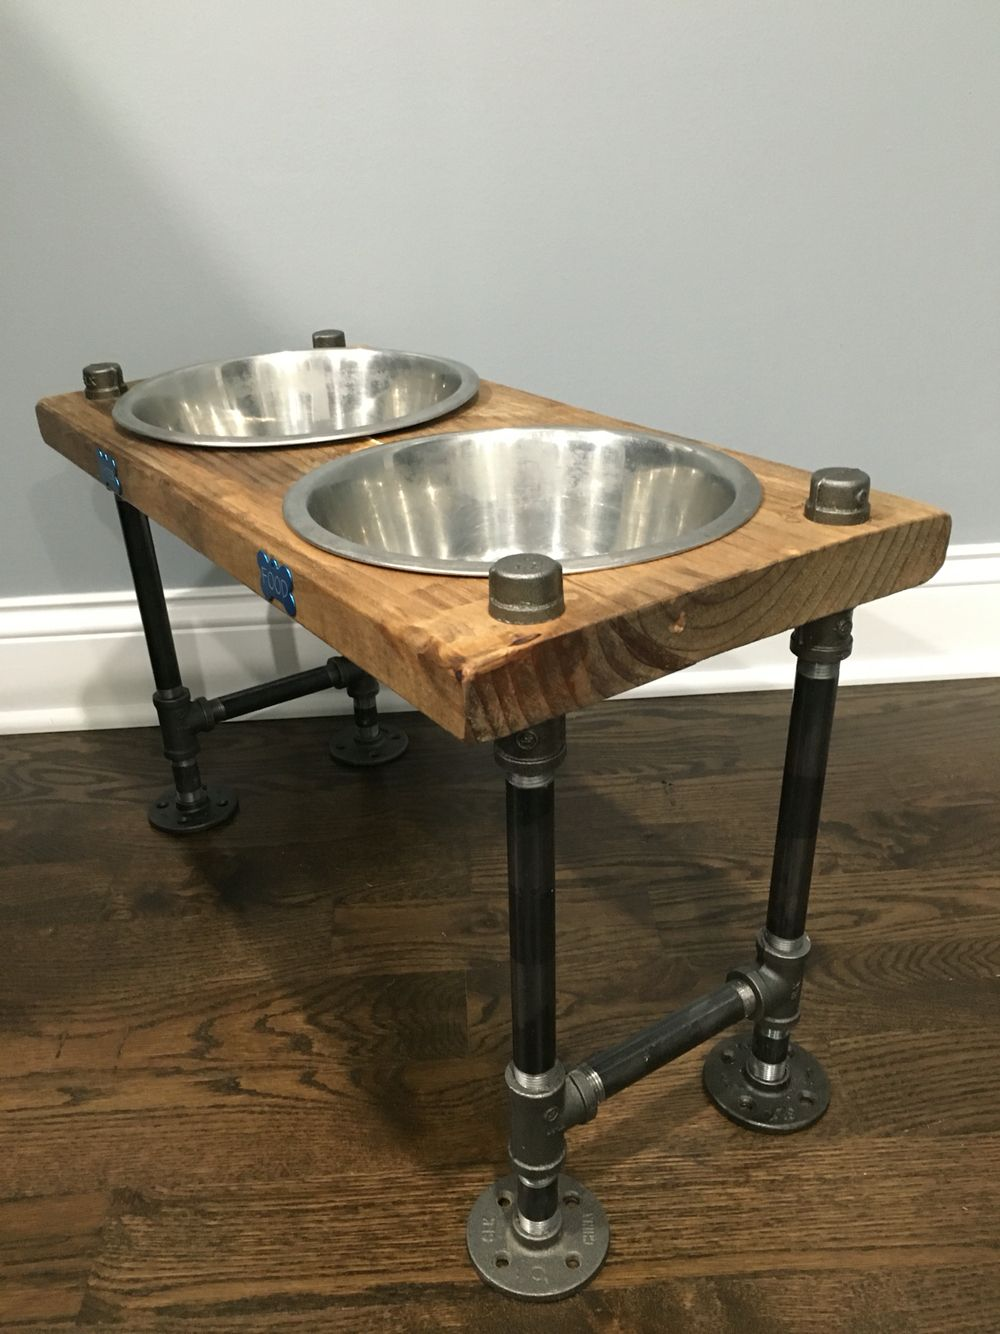 Rustic Dog Bowl Feeder By Lightrooom On Etsy